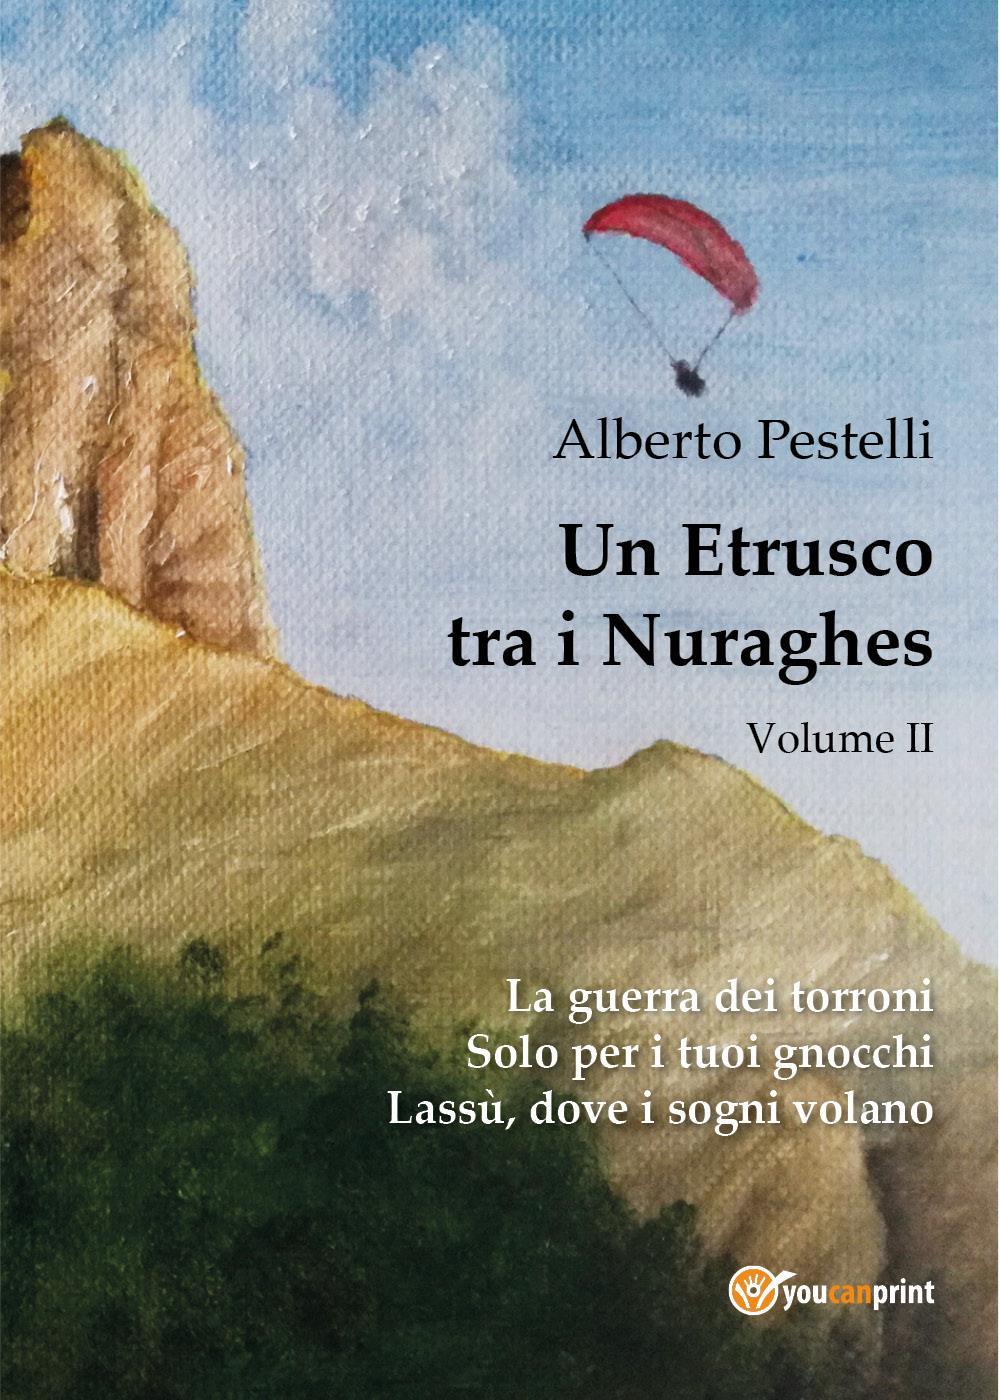 Un Etrusco tra i Nuraghes - Volume II